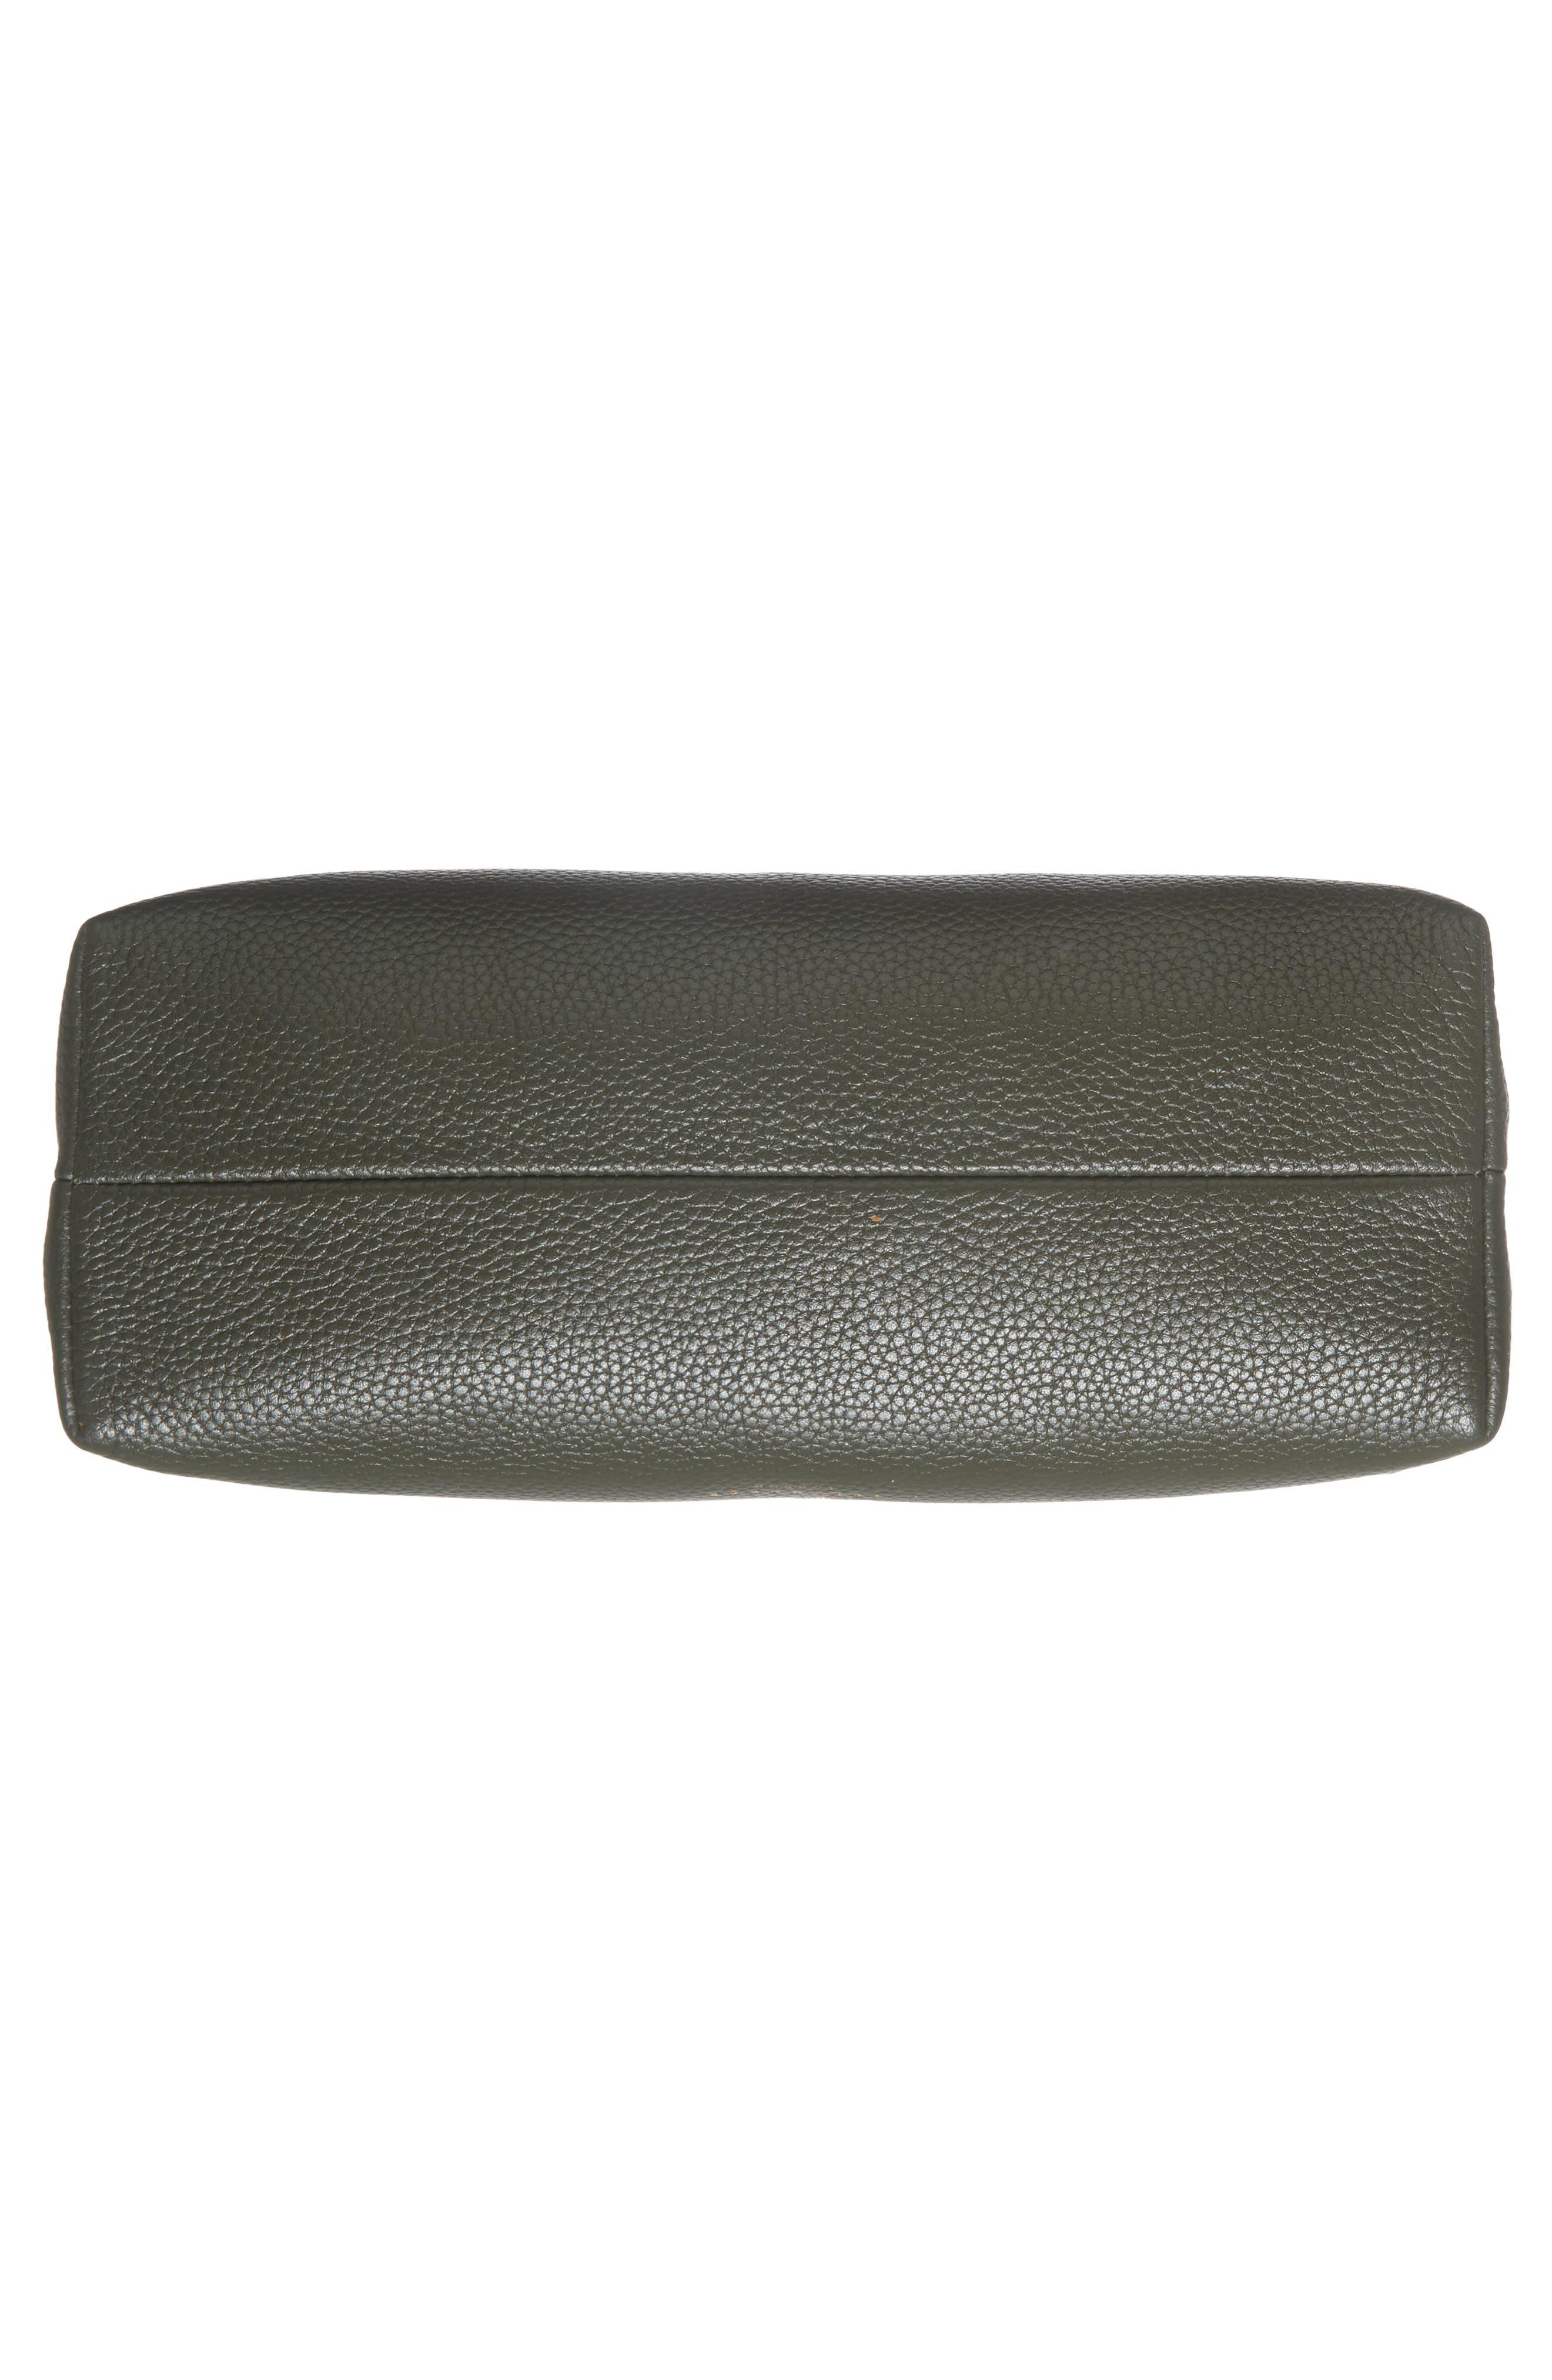 Sorikai Leather & Suede Crossbody Bag,                             Alternate thumbnail 6, color,                             312